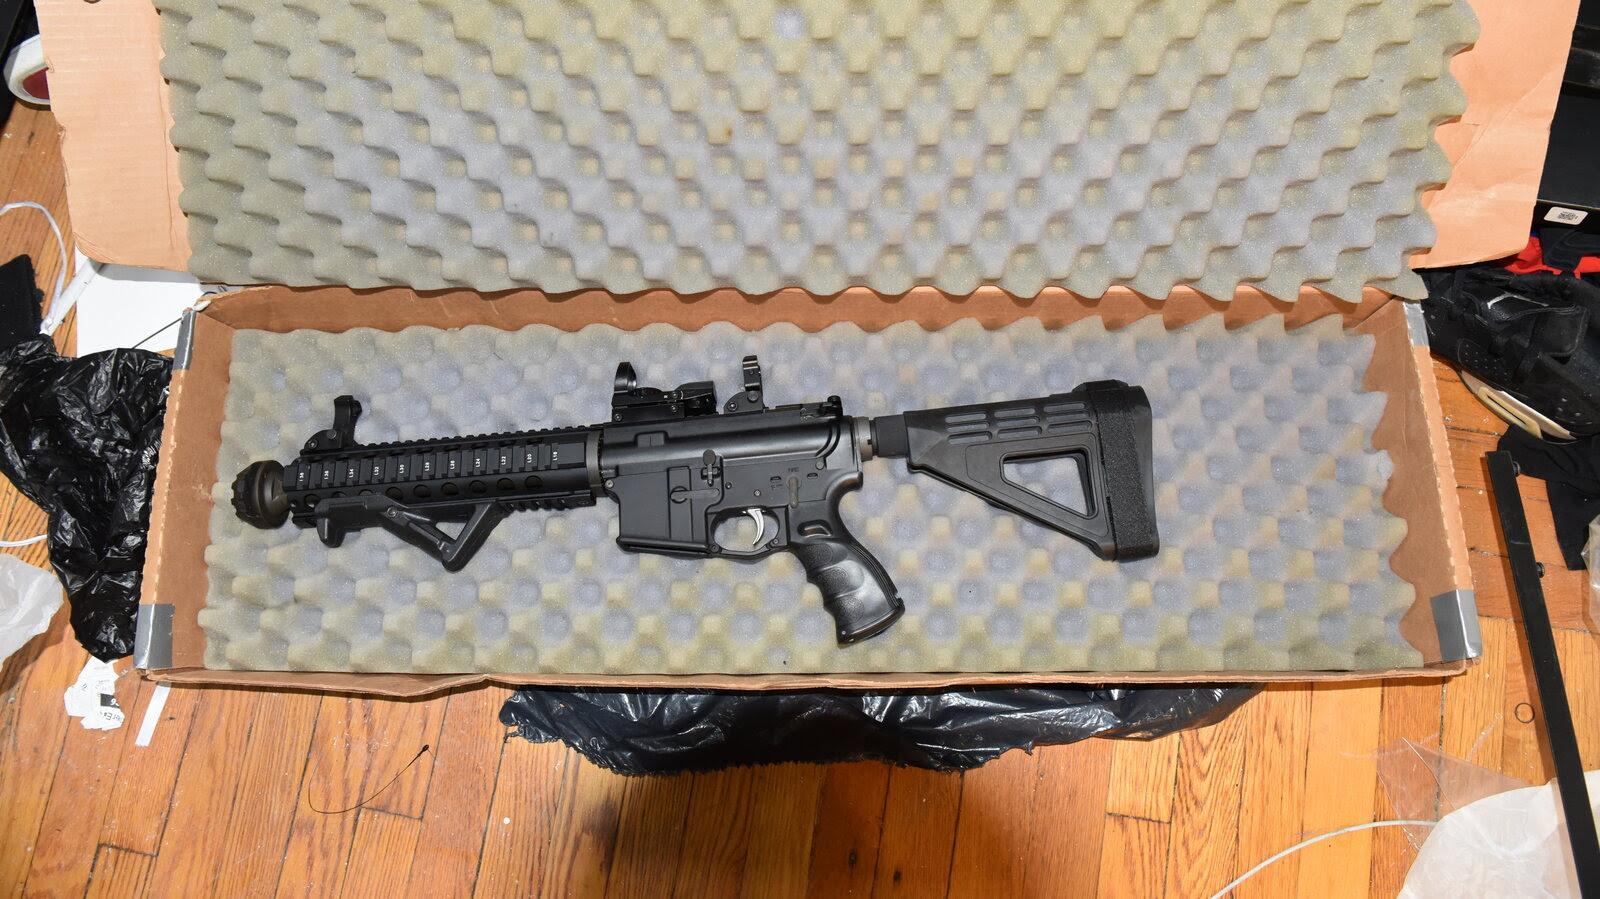 Manca P. Vrhovnik Vz.58 Polenar Tactical   Guns, Weapons